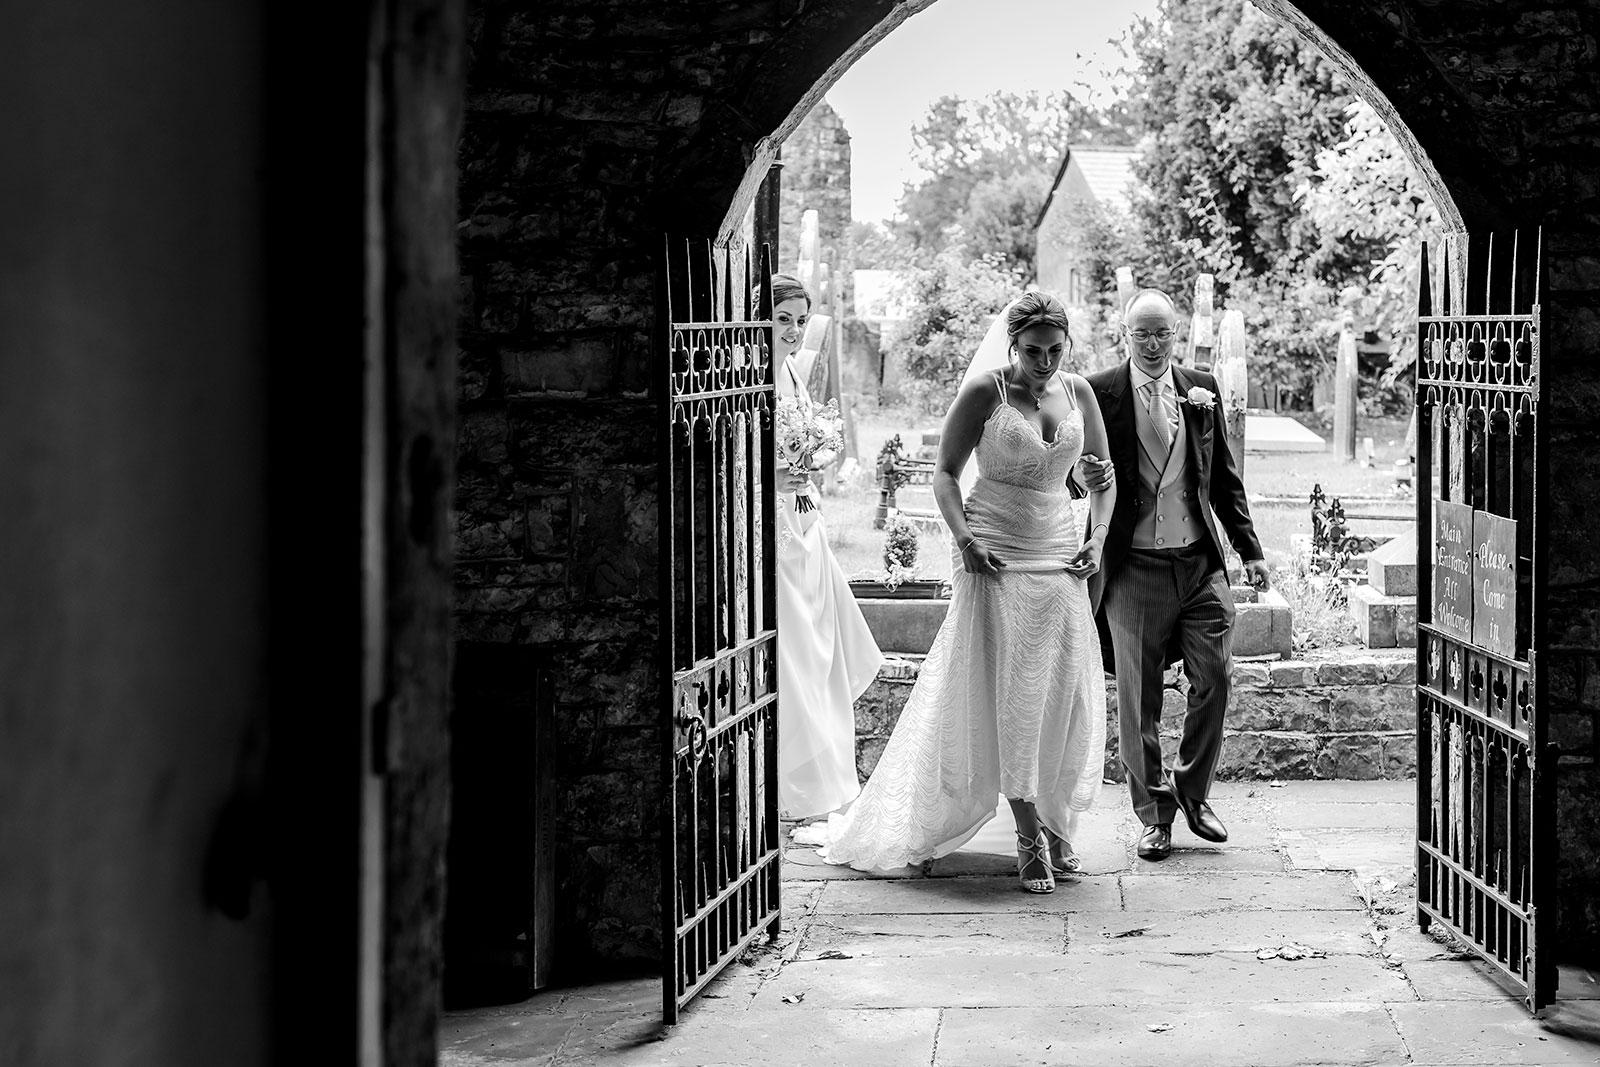 St illtud's Wedding Llantwit Major